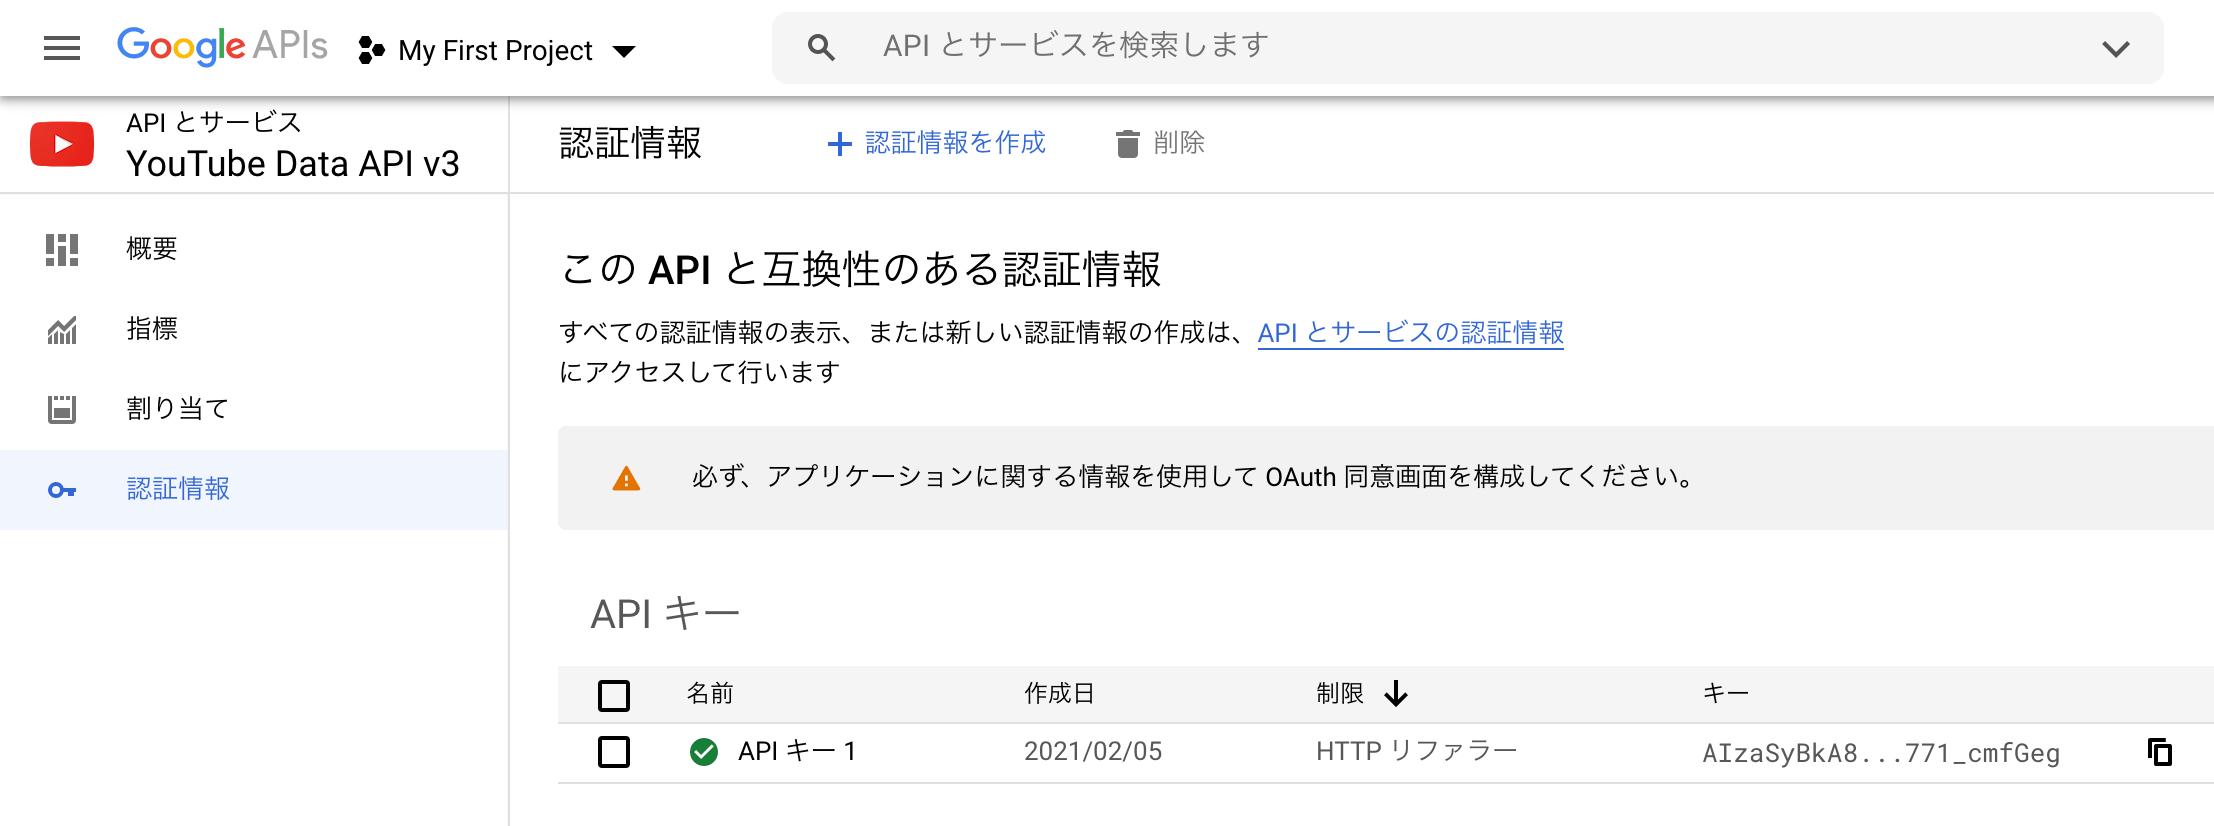 YouTube Data APIキー